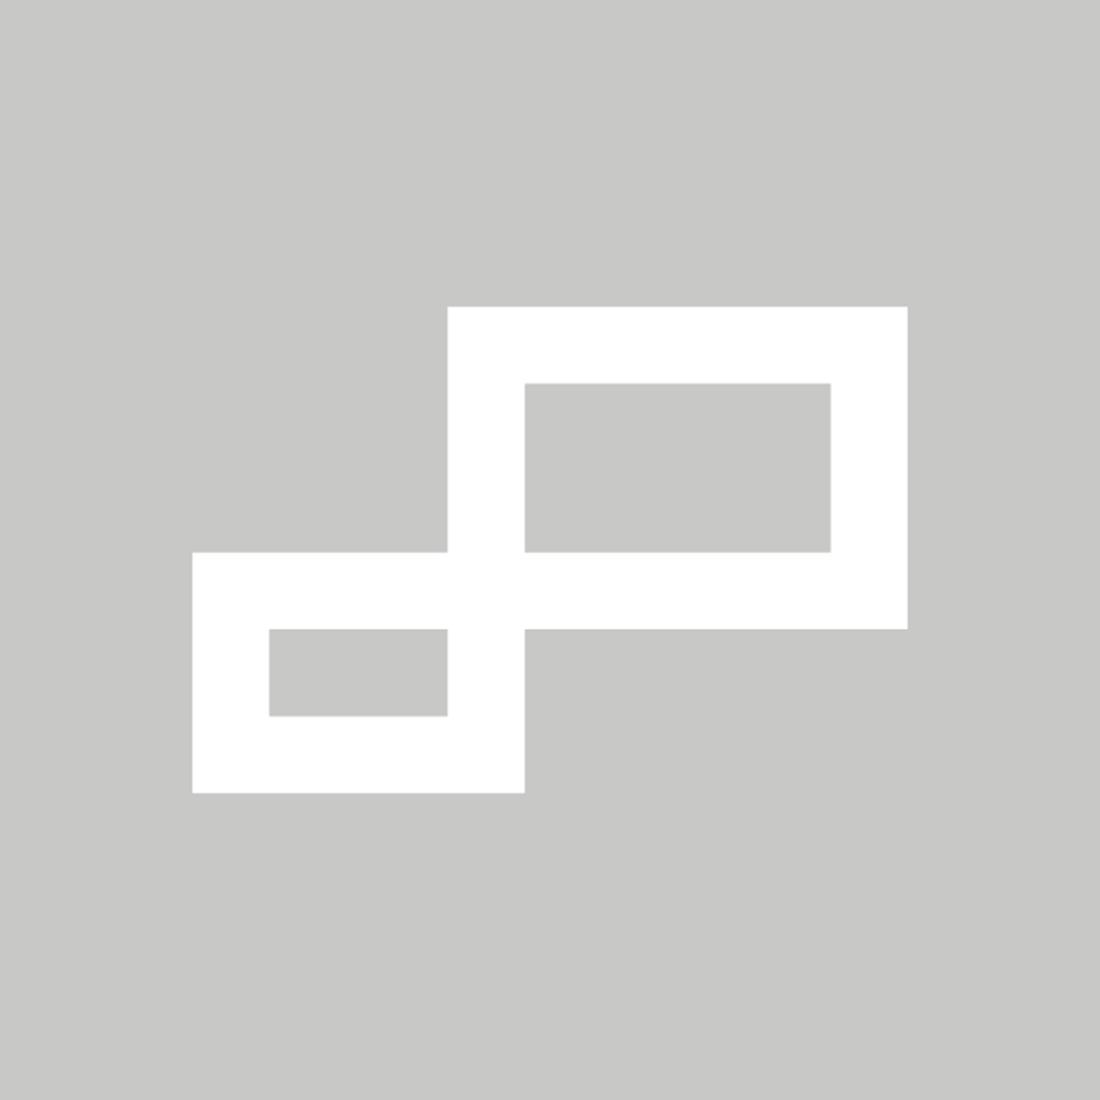 "4"" x 3"" On-Site Registration Event Badge"